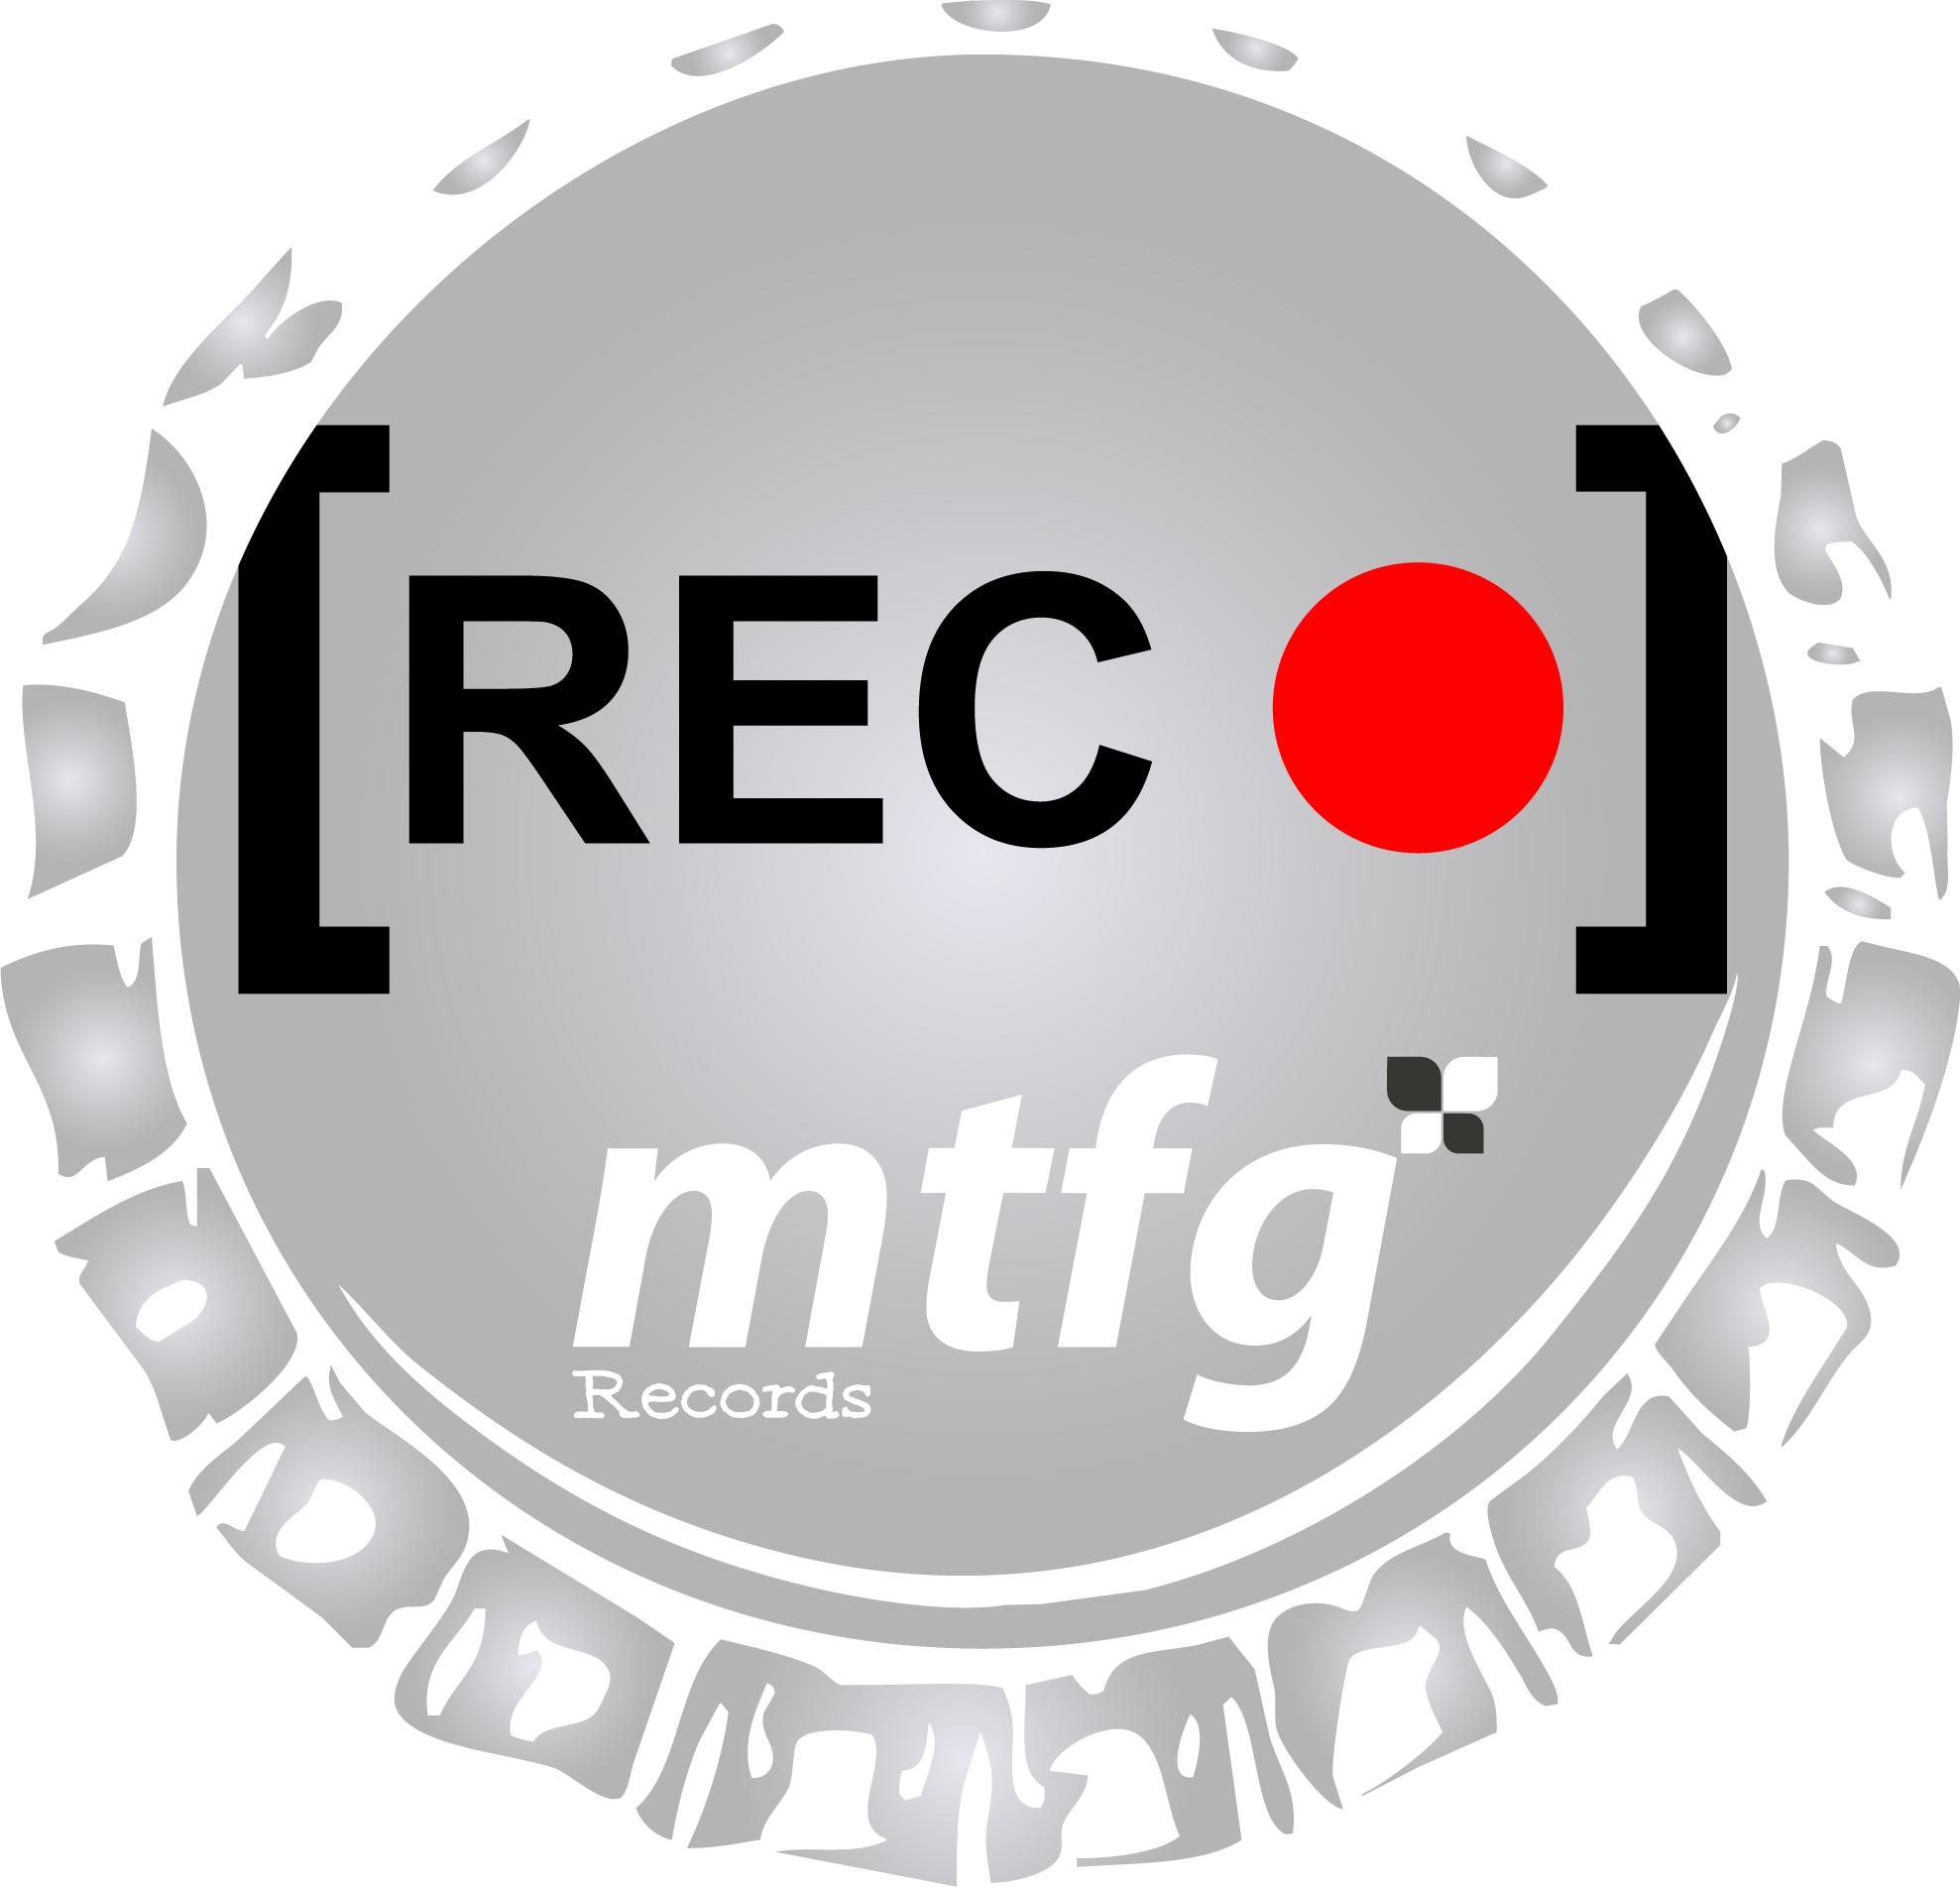 MTFG Records